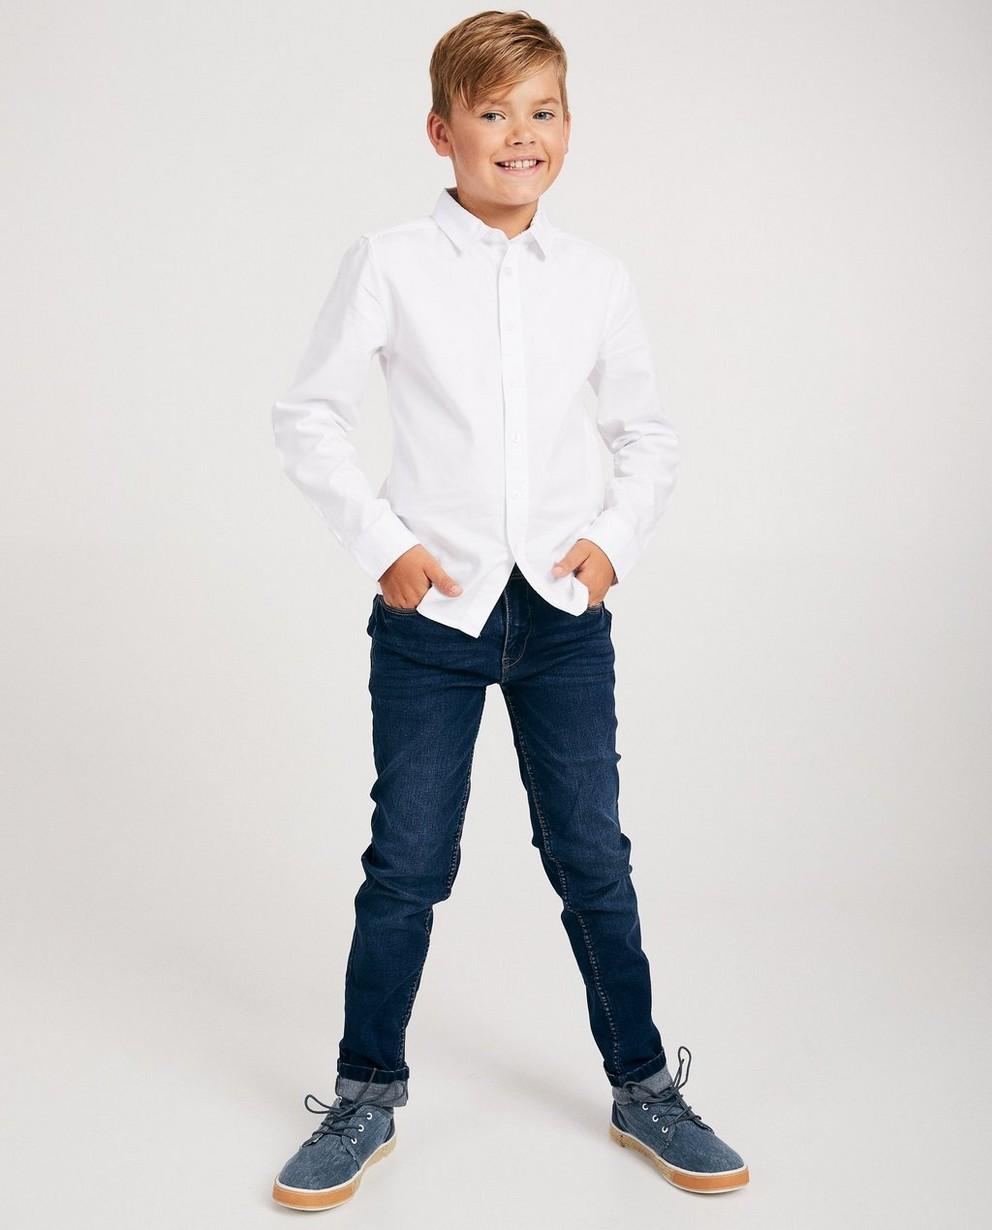 Pantalon dry denim SIMON - 7-14 ans, délavé - JBC